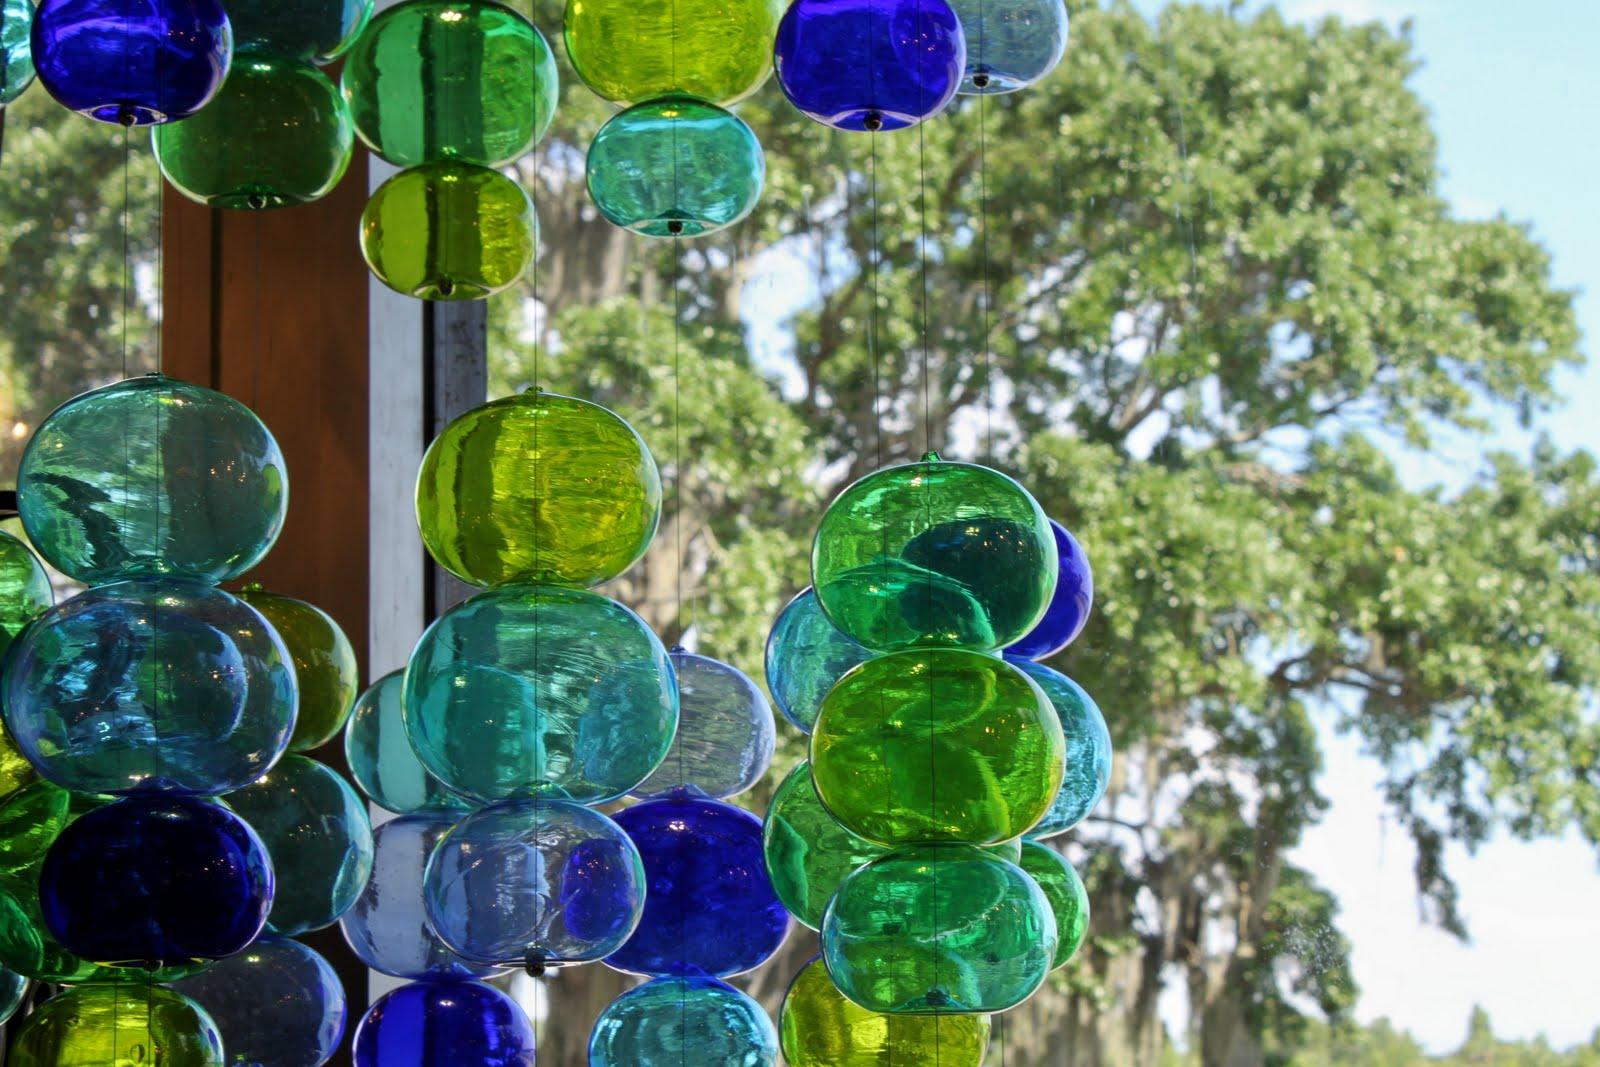 Lightstyle of orlando art glass lighting for Recycled glass art